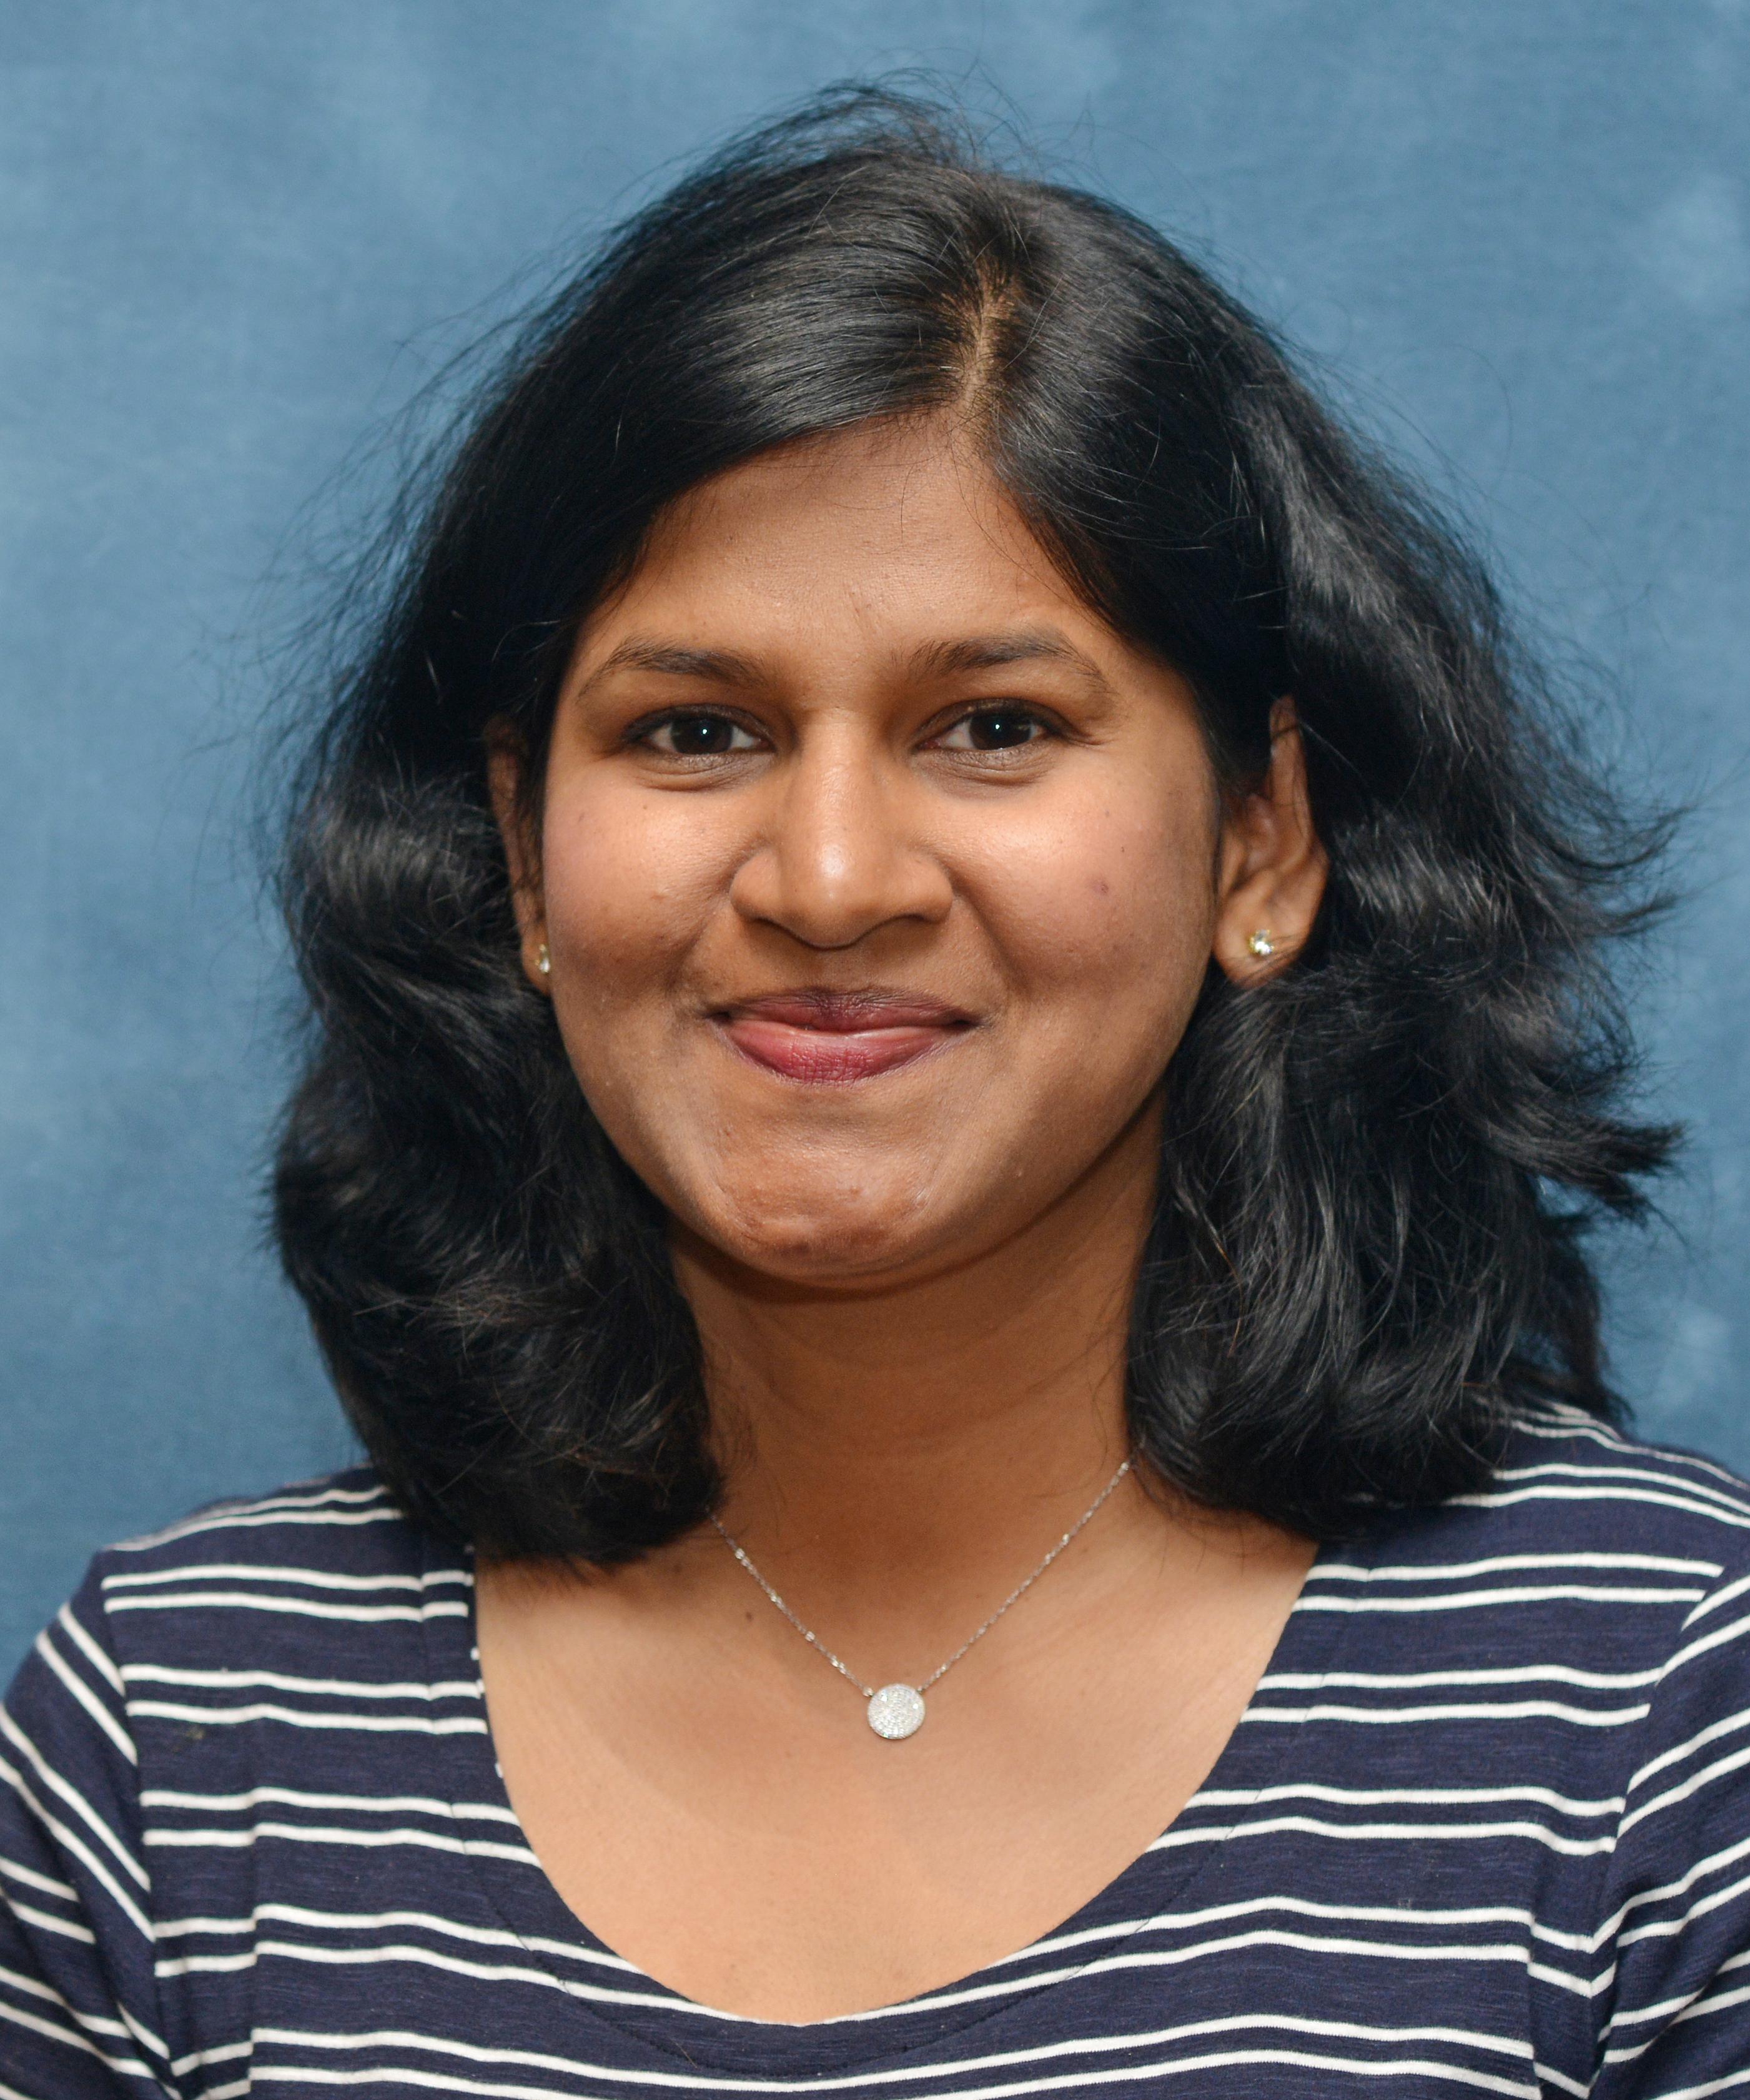 Photo of                                                                                                                                                                                                                                                                                                                                                                                                                                                                                                                                                                                                                                                                                                                                                                                                                                                                                                                                                                                                                                                                                                                 Anisha                                                                                                                                                                                                                                                                                                                                                                                                                                                                                                                                                                                                                                                                                                                                                                                                                                                                                                                                                 